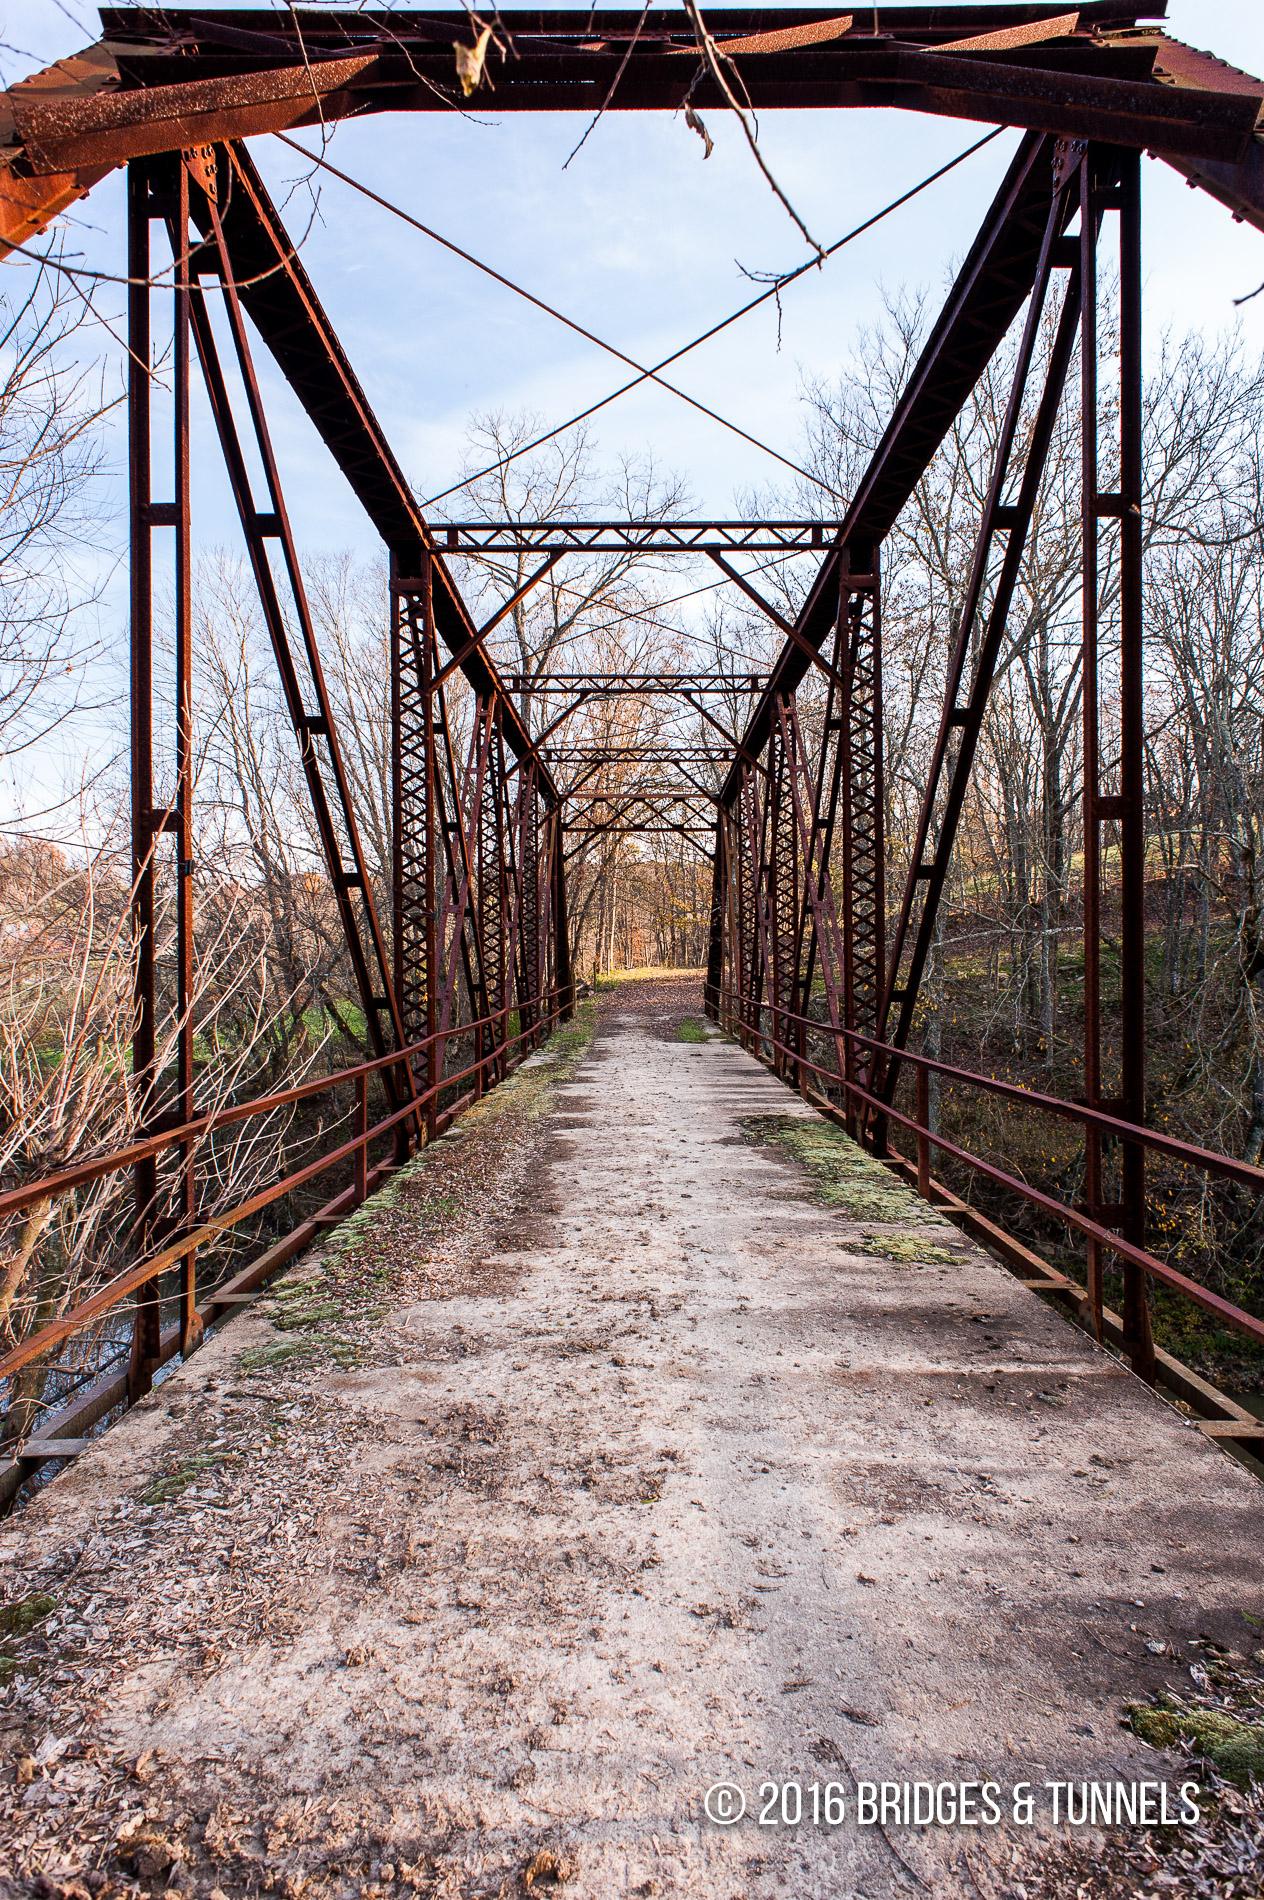 South Fork Grassy Creek Bridge (Old KY 1657)